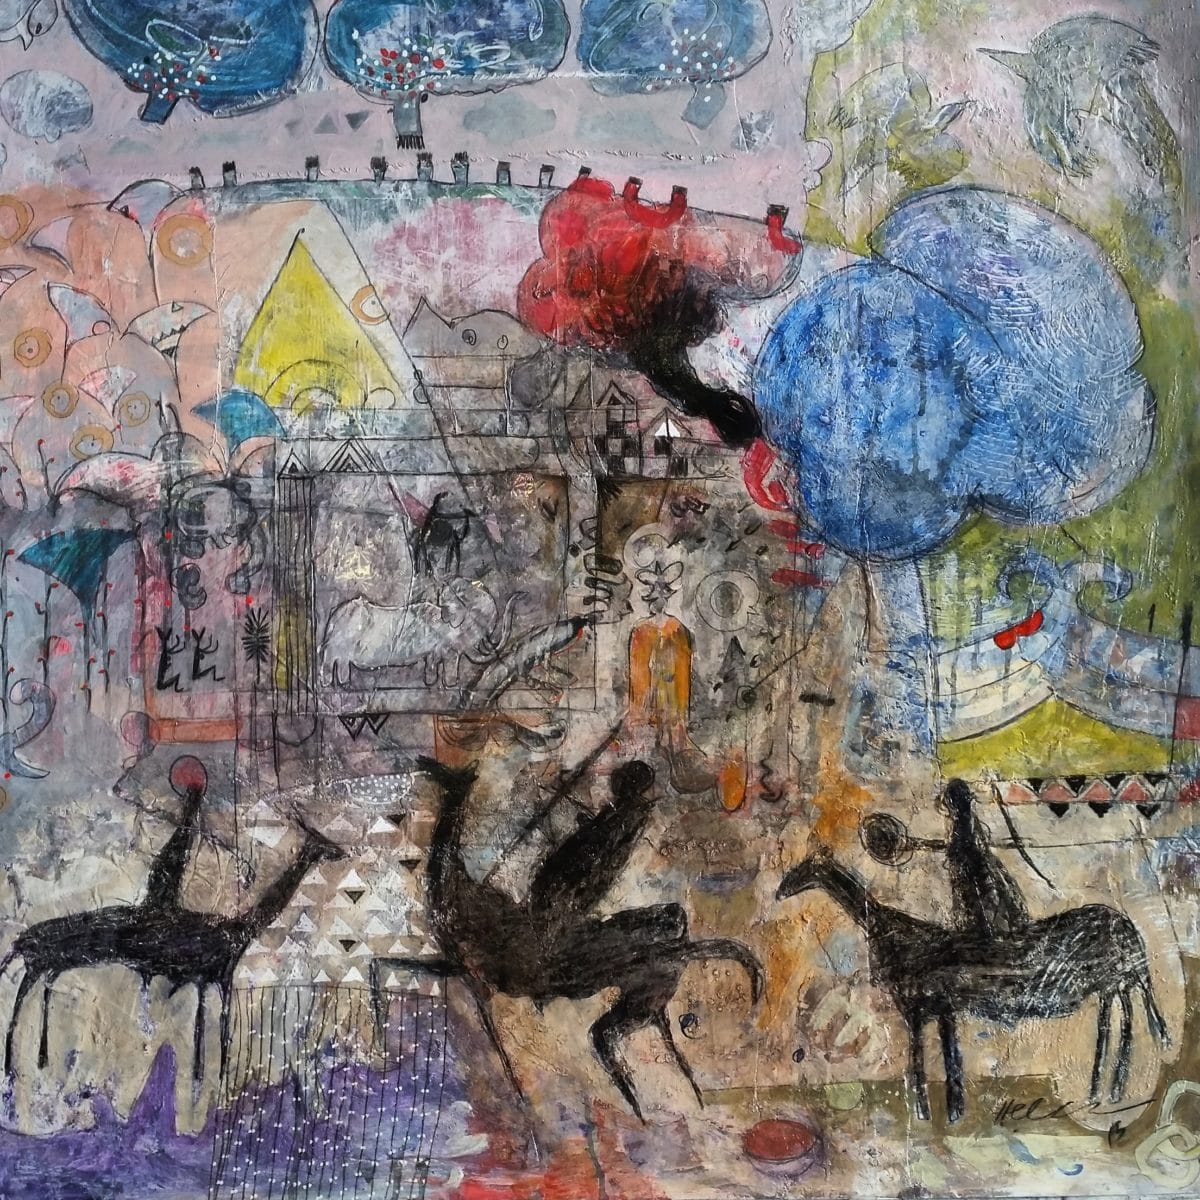 Hussein Salim - Mixed Media on Card - 2015